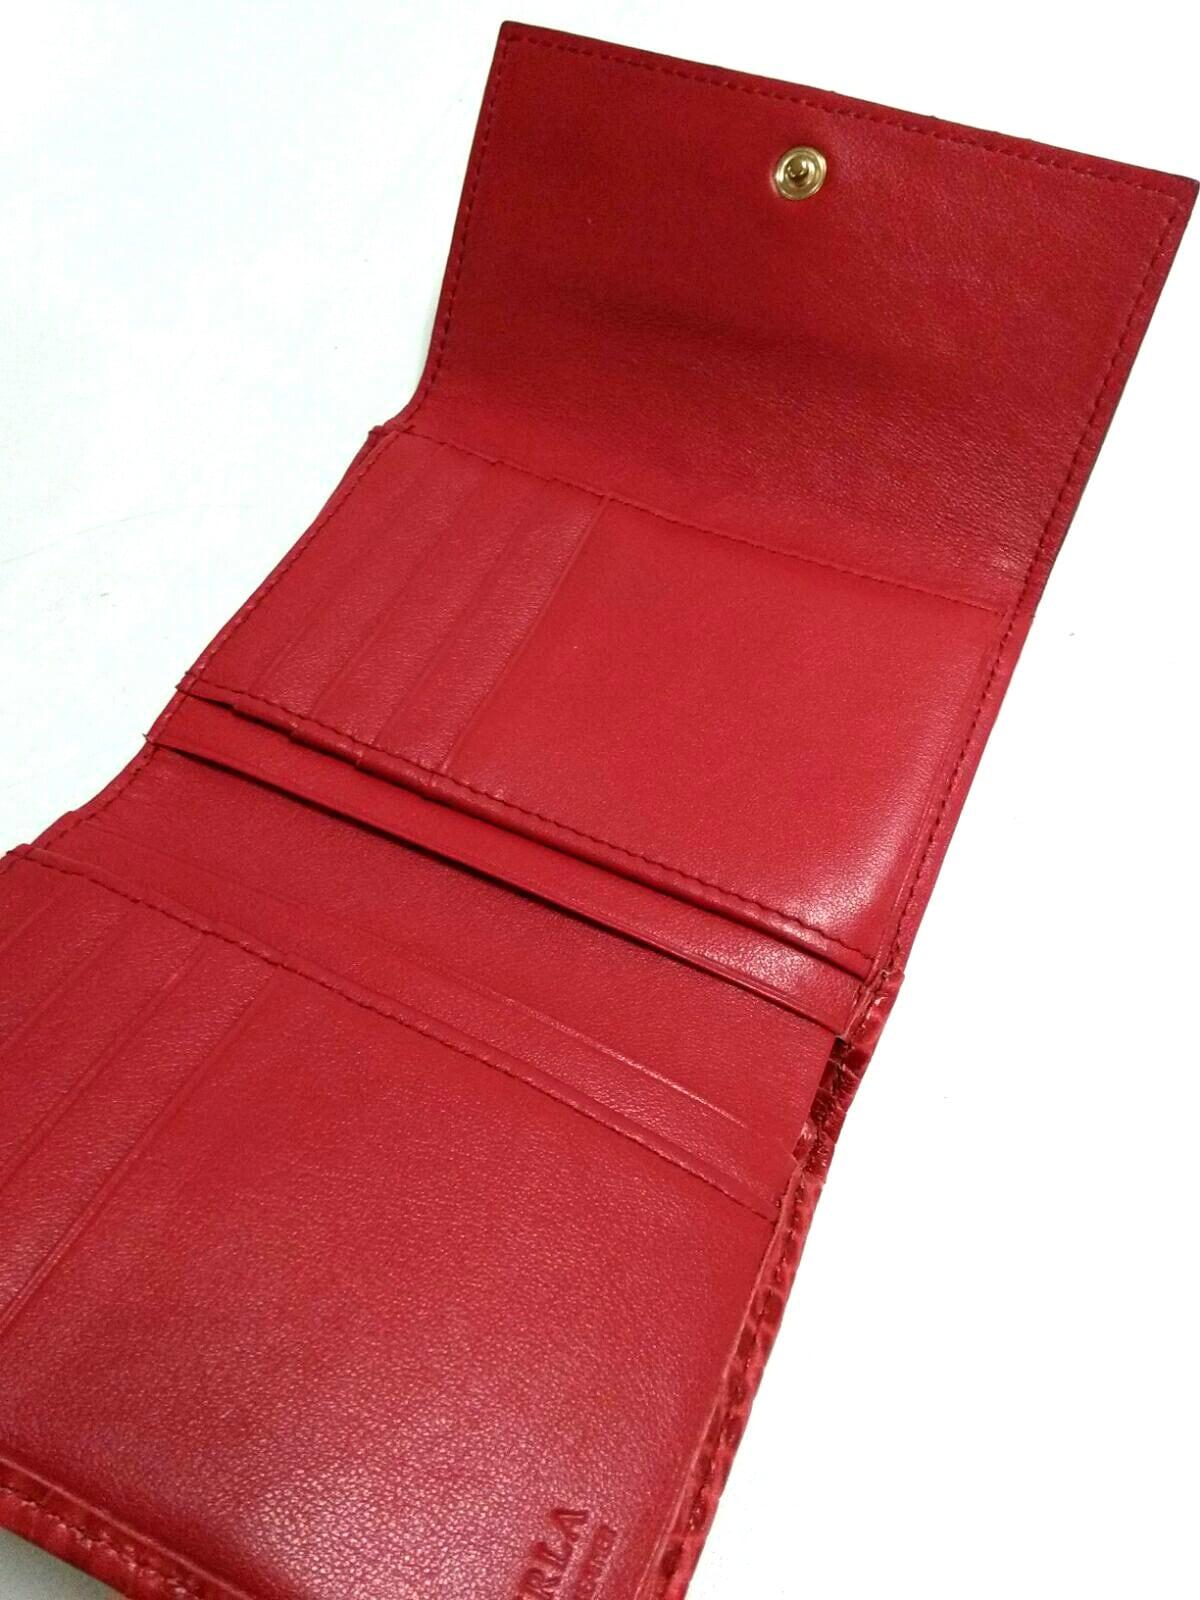 a920446da186 FURLA(フルラ) 3つ折り財布美品 レッド 型押し加工 レザー(13230980 ...